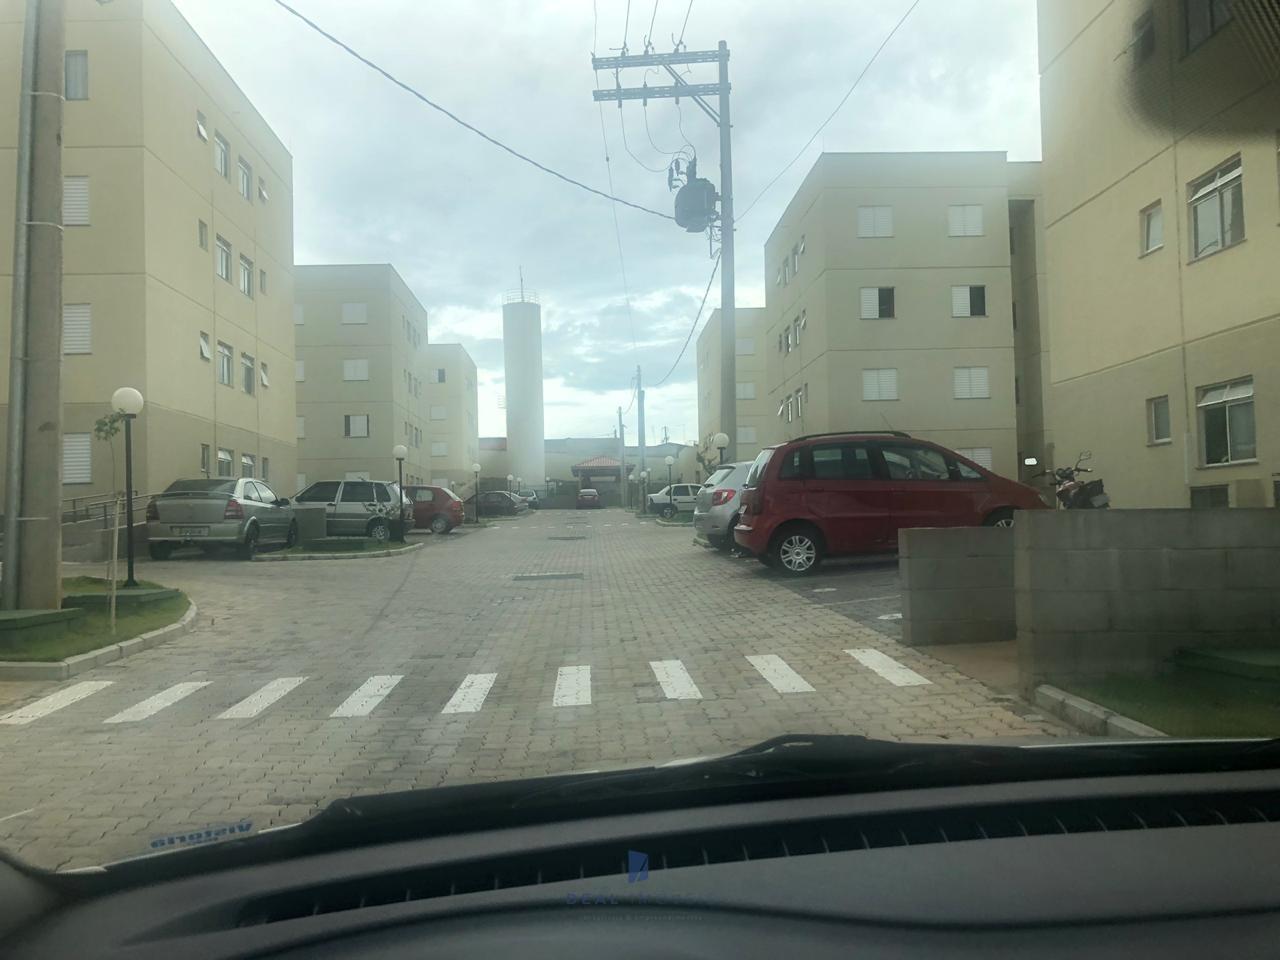 01 - Condomínio Volpi no Lopes de Oliveira